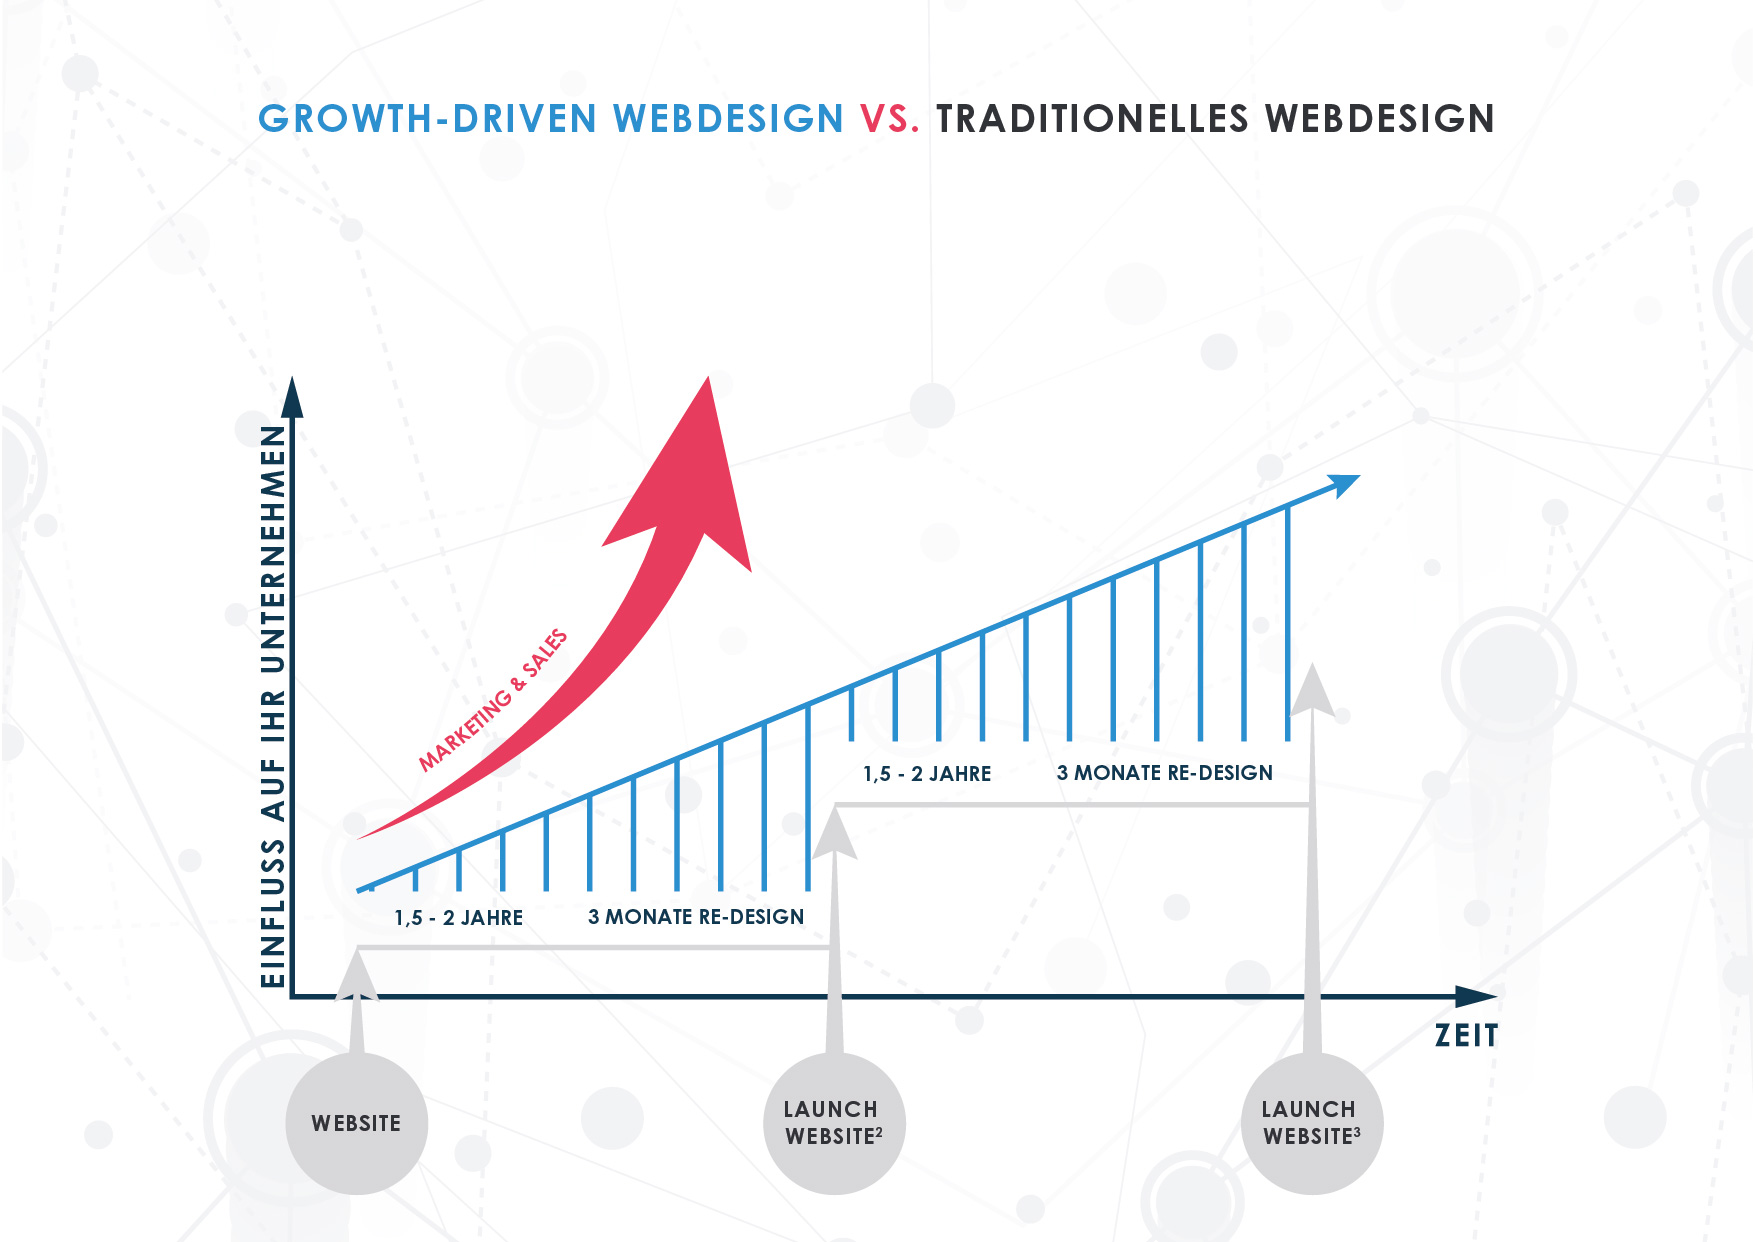 TRI_Infografik-Traditionelles-Webdesign_K-A4-NEU-04